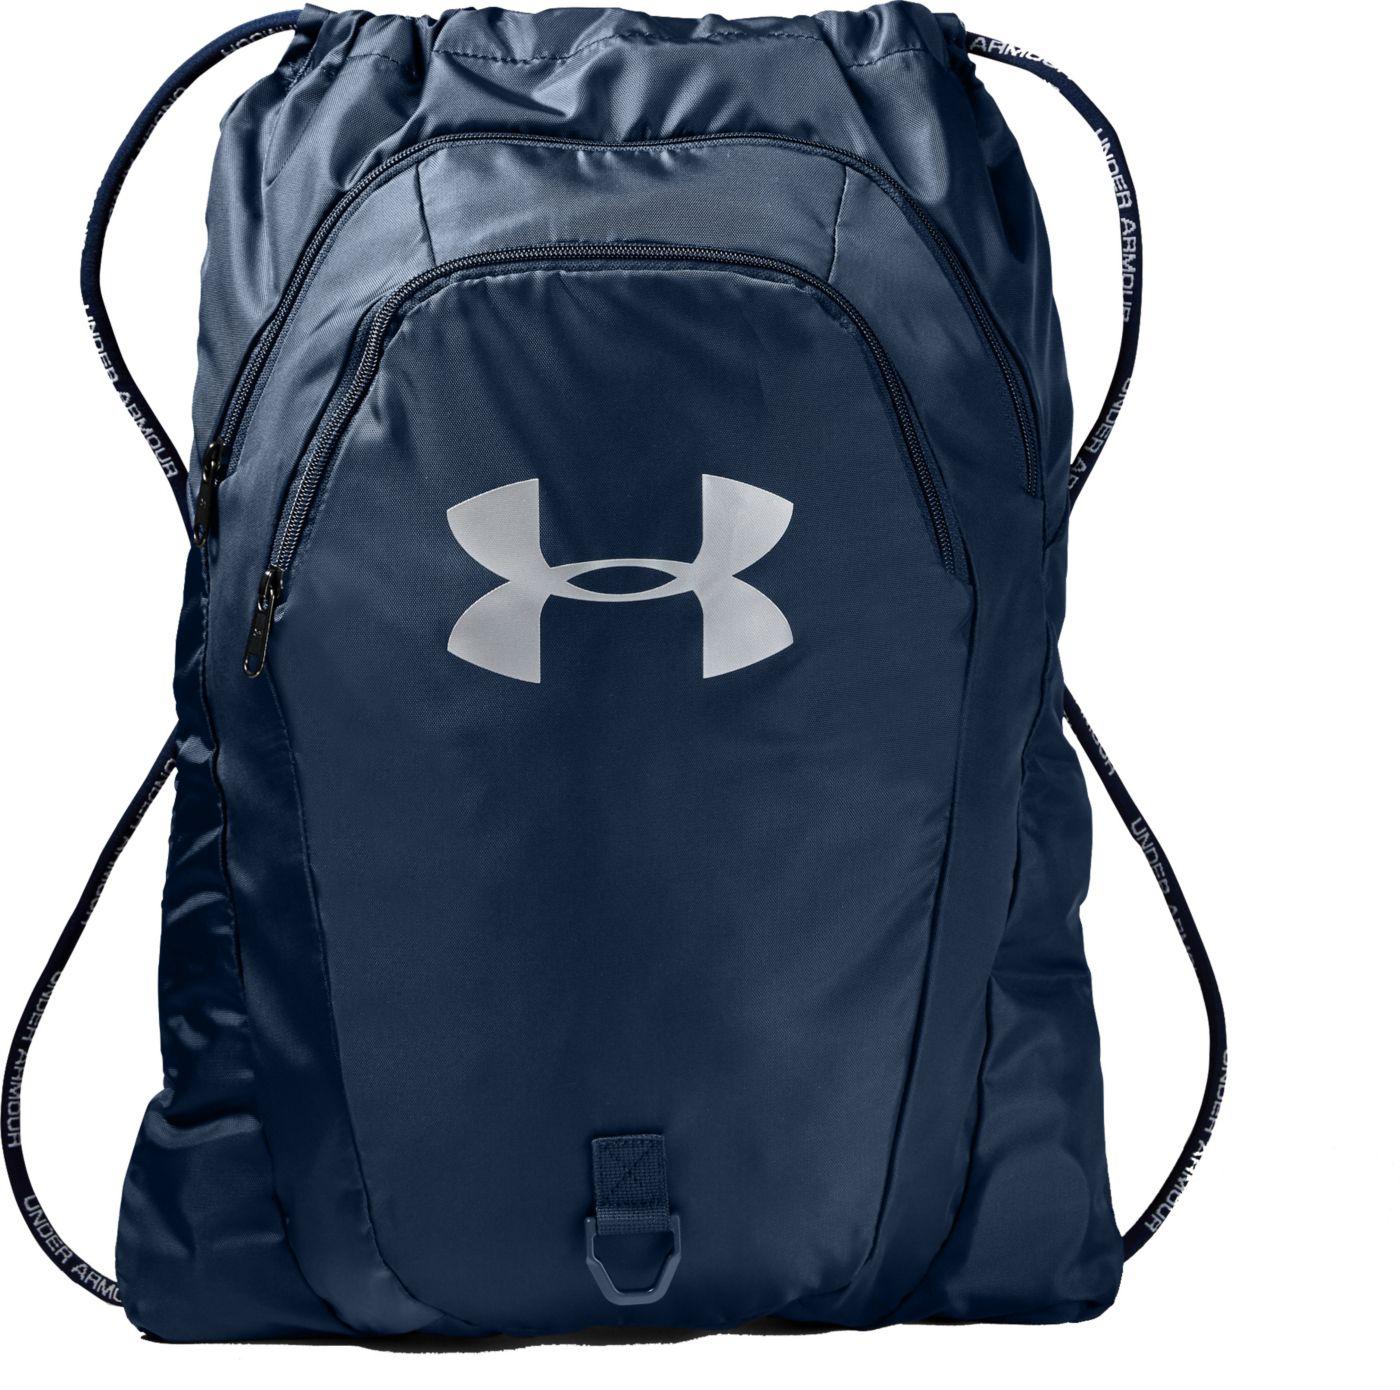 Under Armour Undeniable 2.0 Drawstring Bag